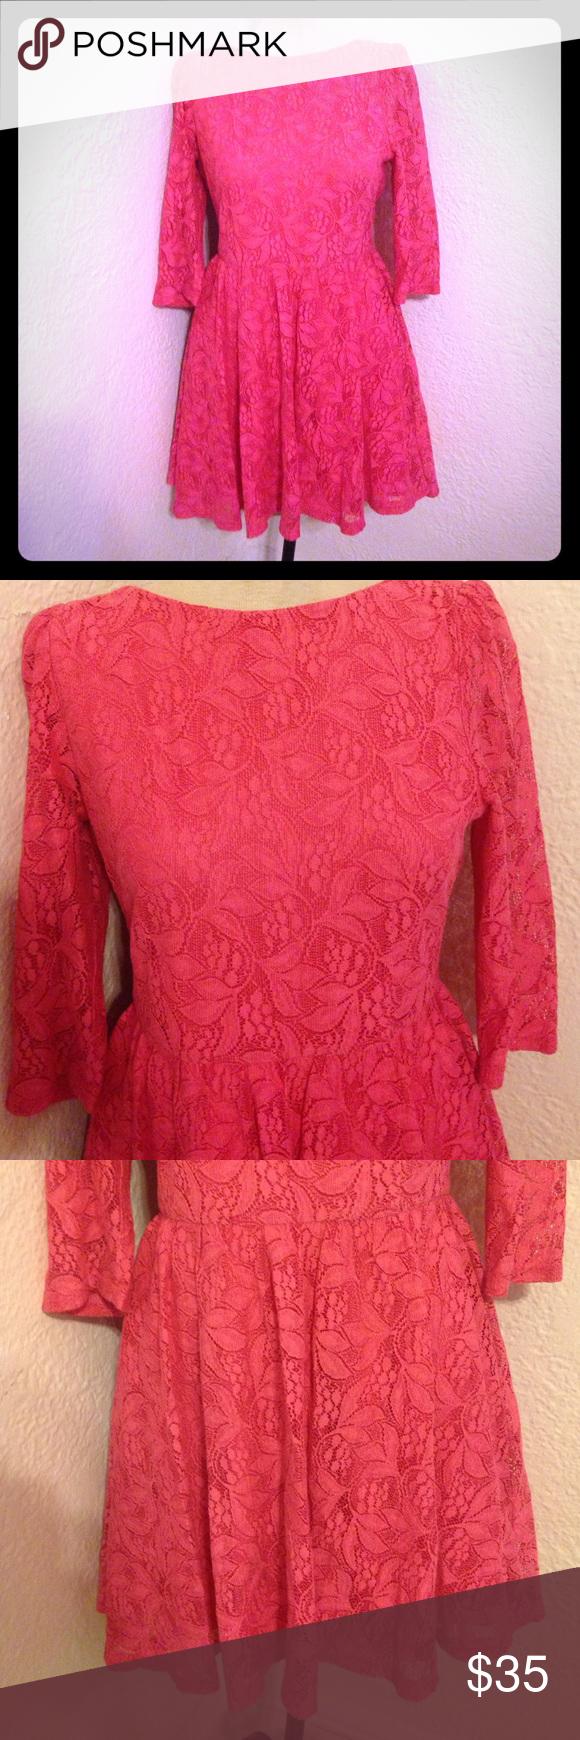 Pink dress topshop  HPTopshop hot pink lace long sleeve dress  Topshop dresses